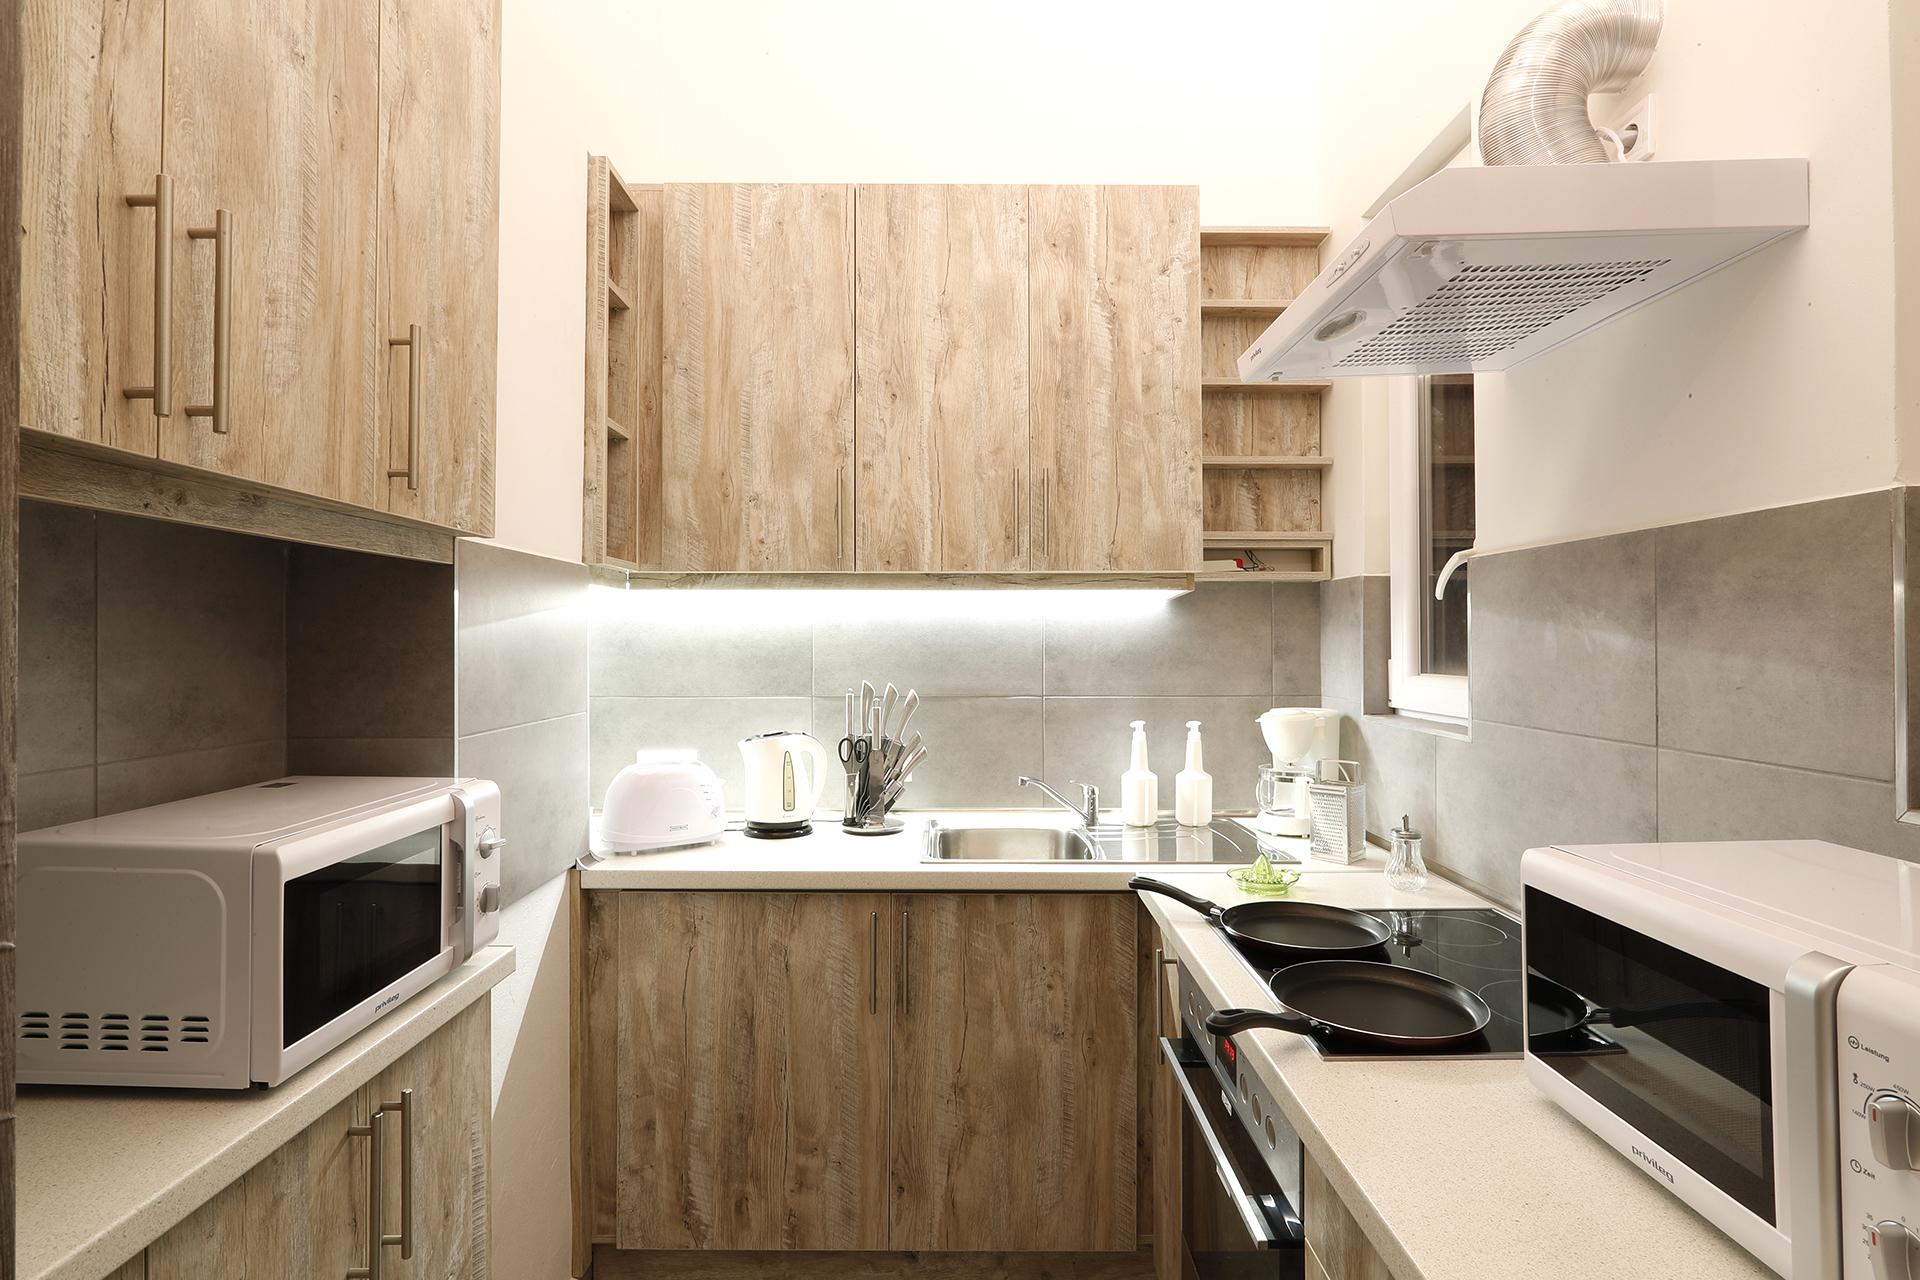 Kitchen_Student_Room_for_rent_Budapest